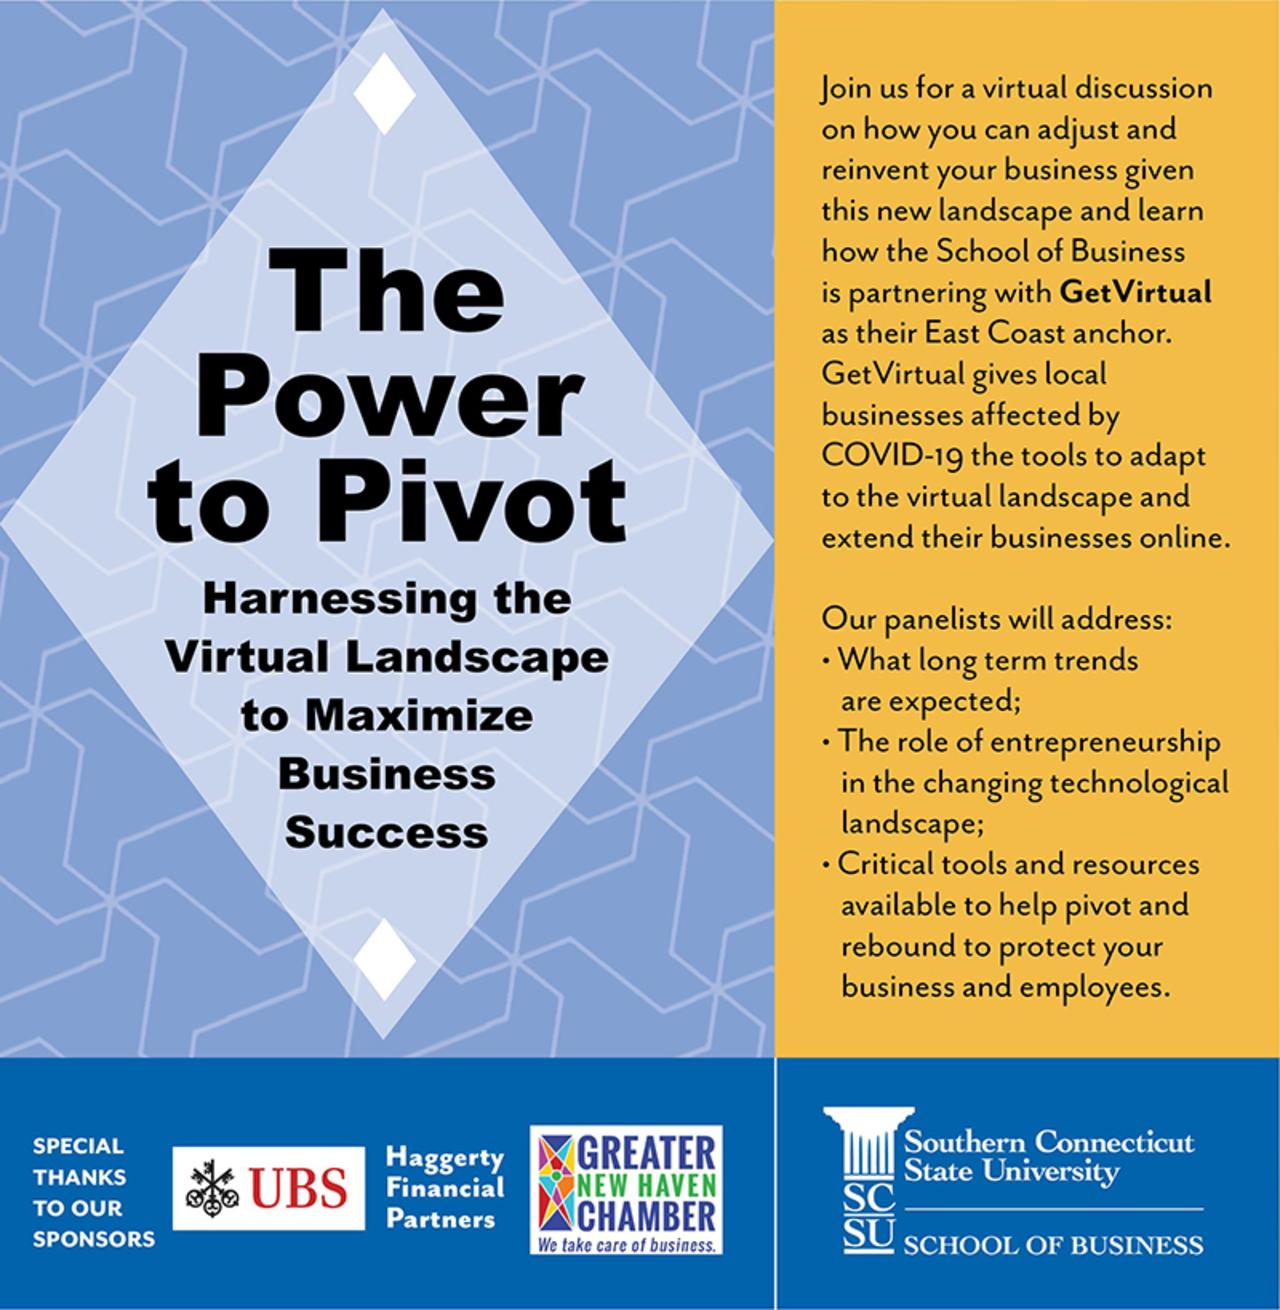 The Power to Pivot